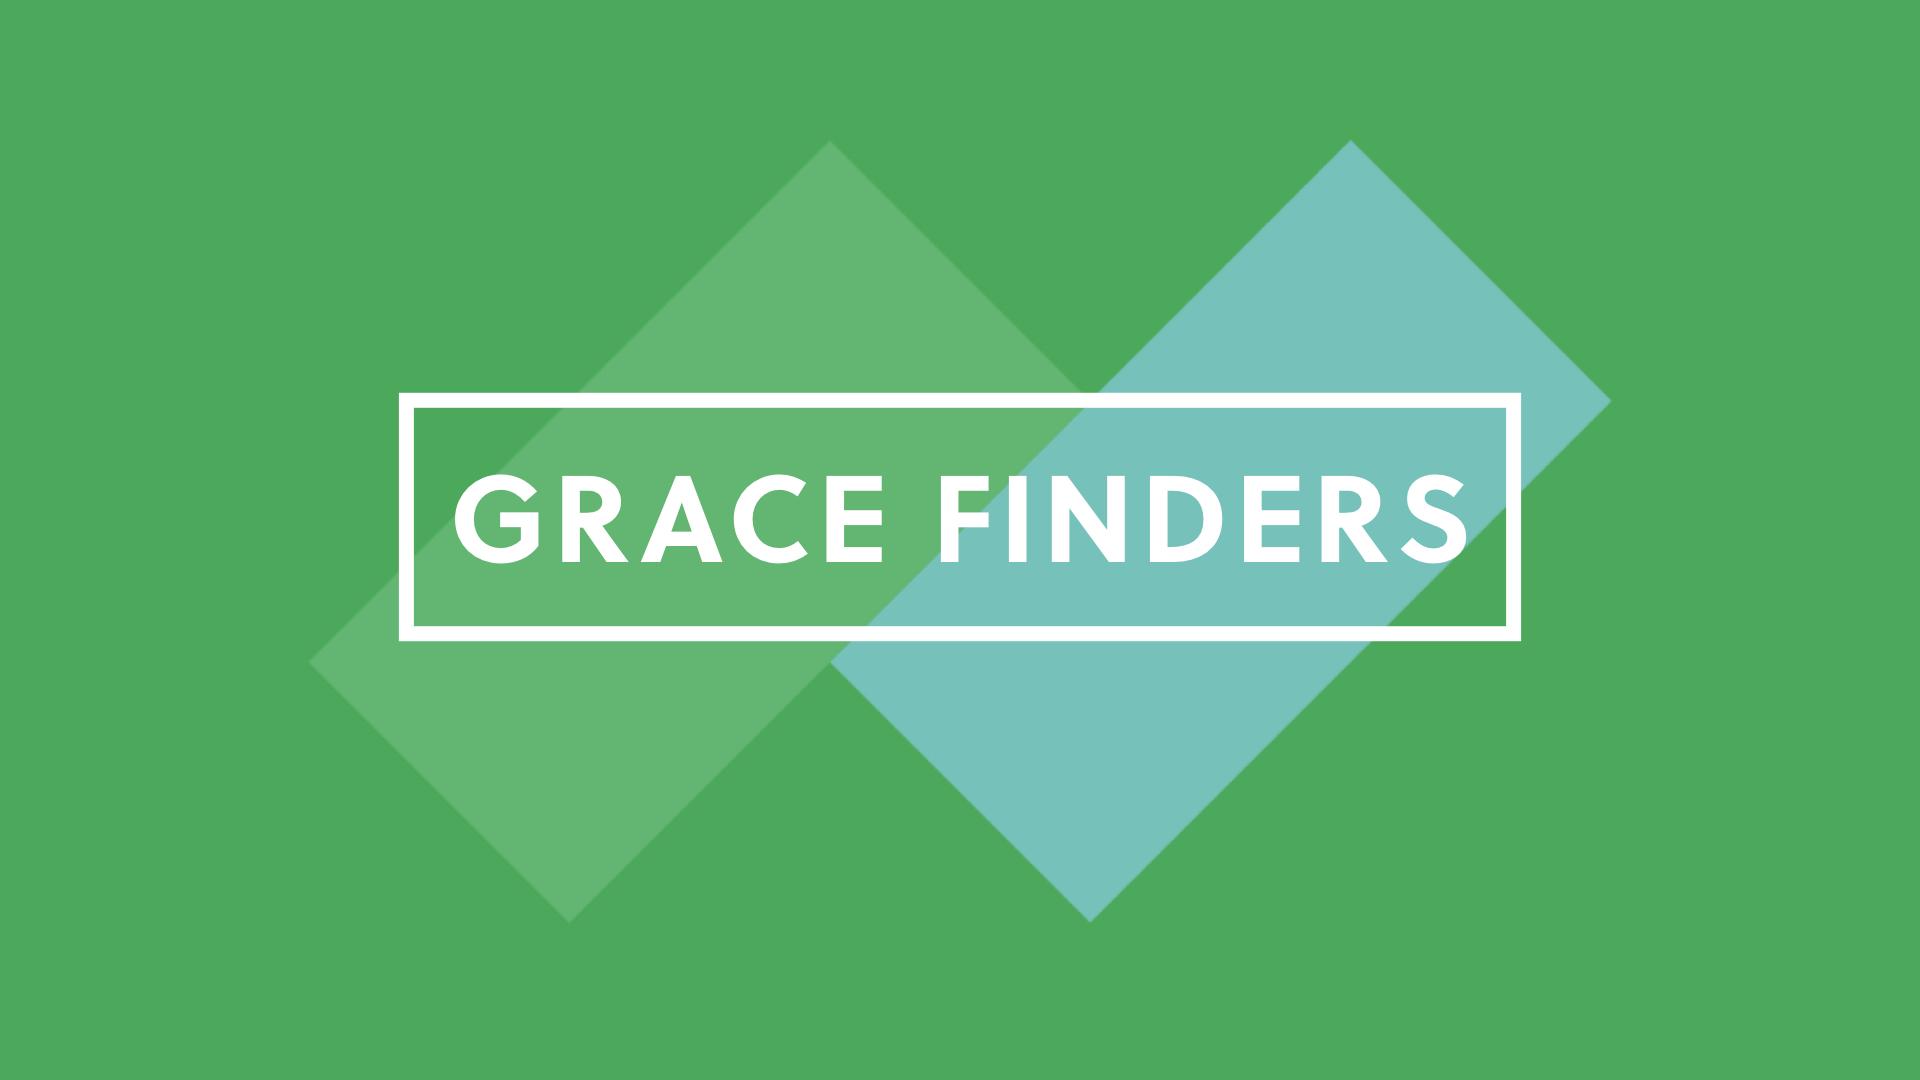 Grace finders.001